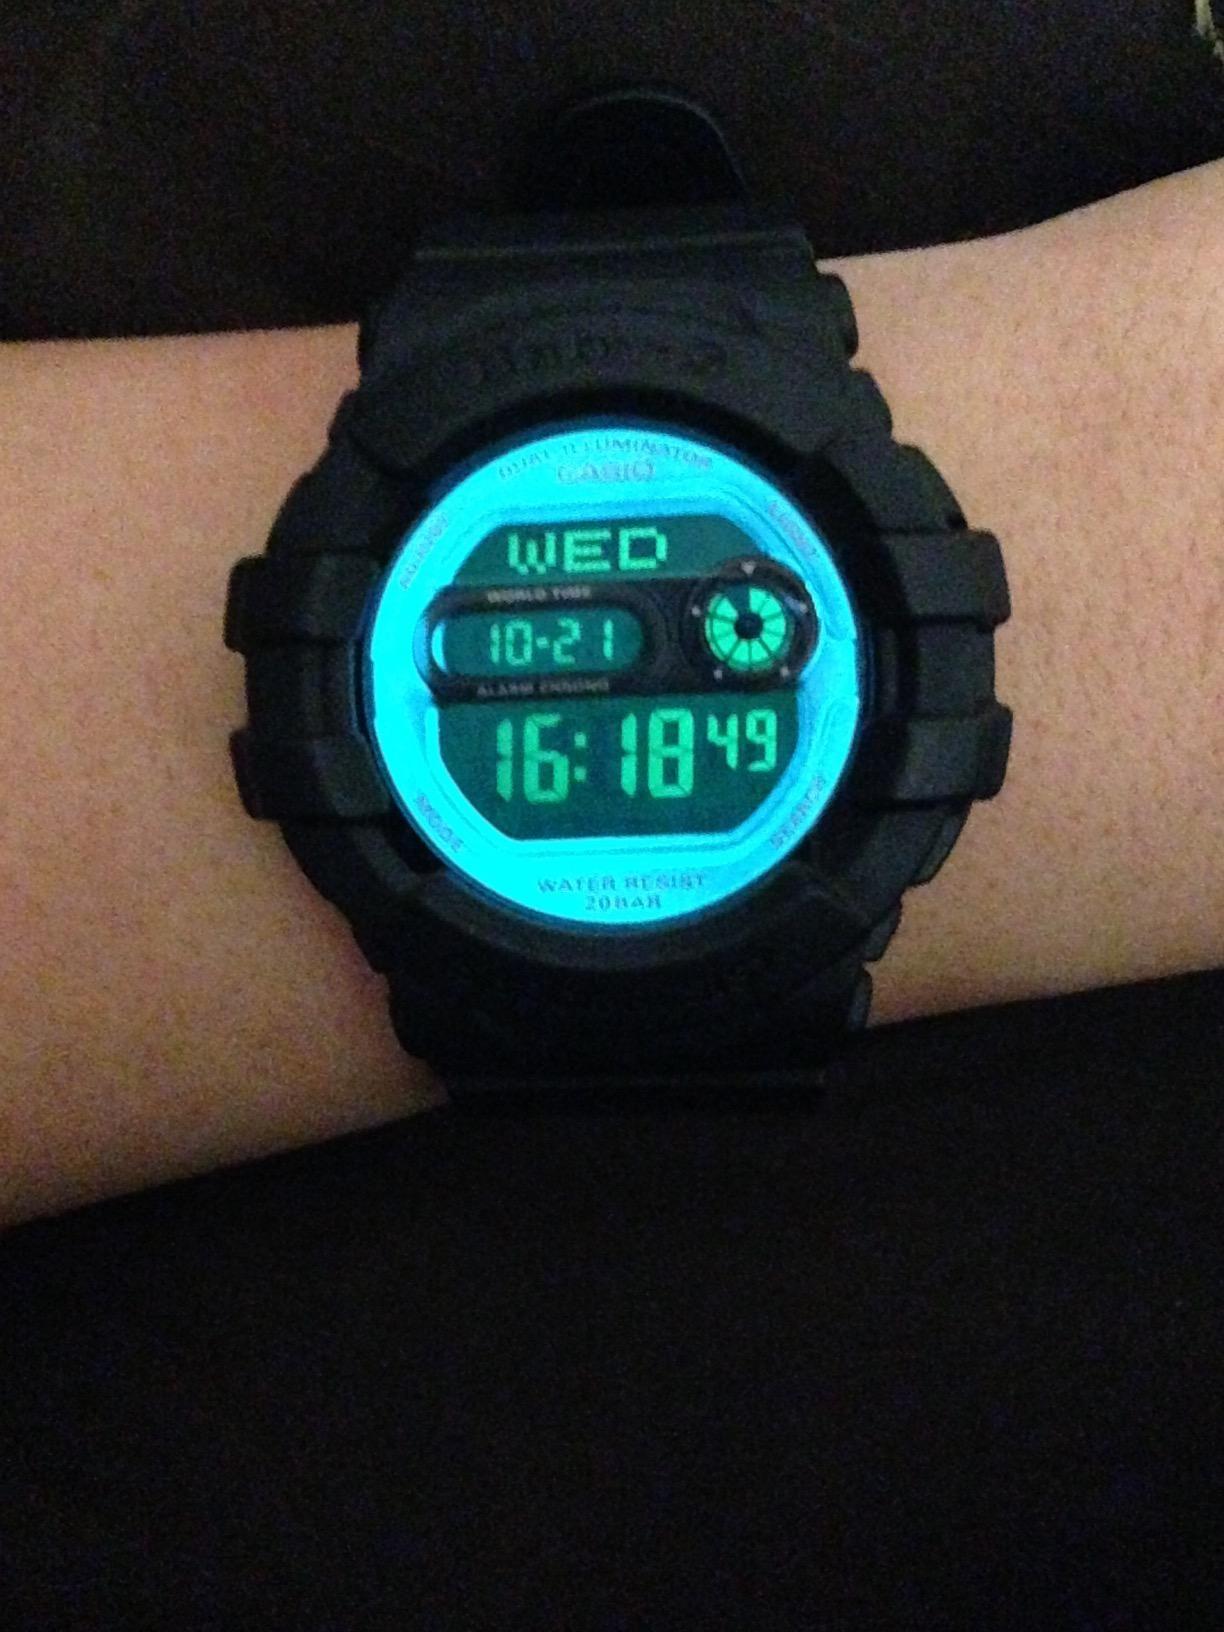 Amazon.com: Casio Women's BGD140-1ACR Baby-G Shock-Resistant Multi-Function Digital Watch: Casio Baby-G: Watches